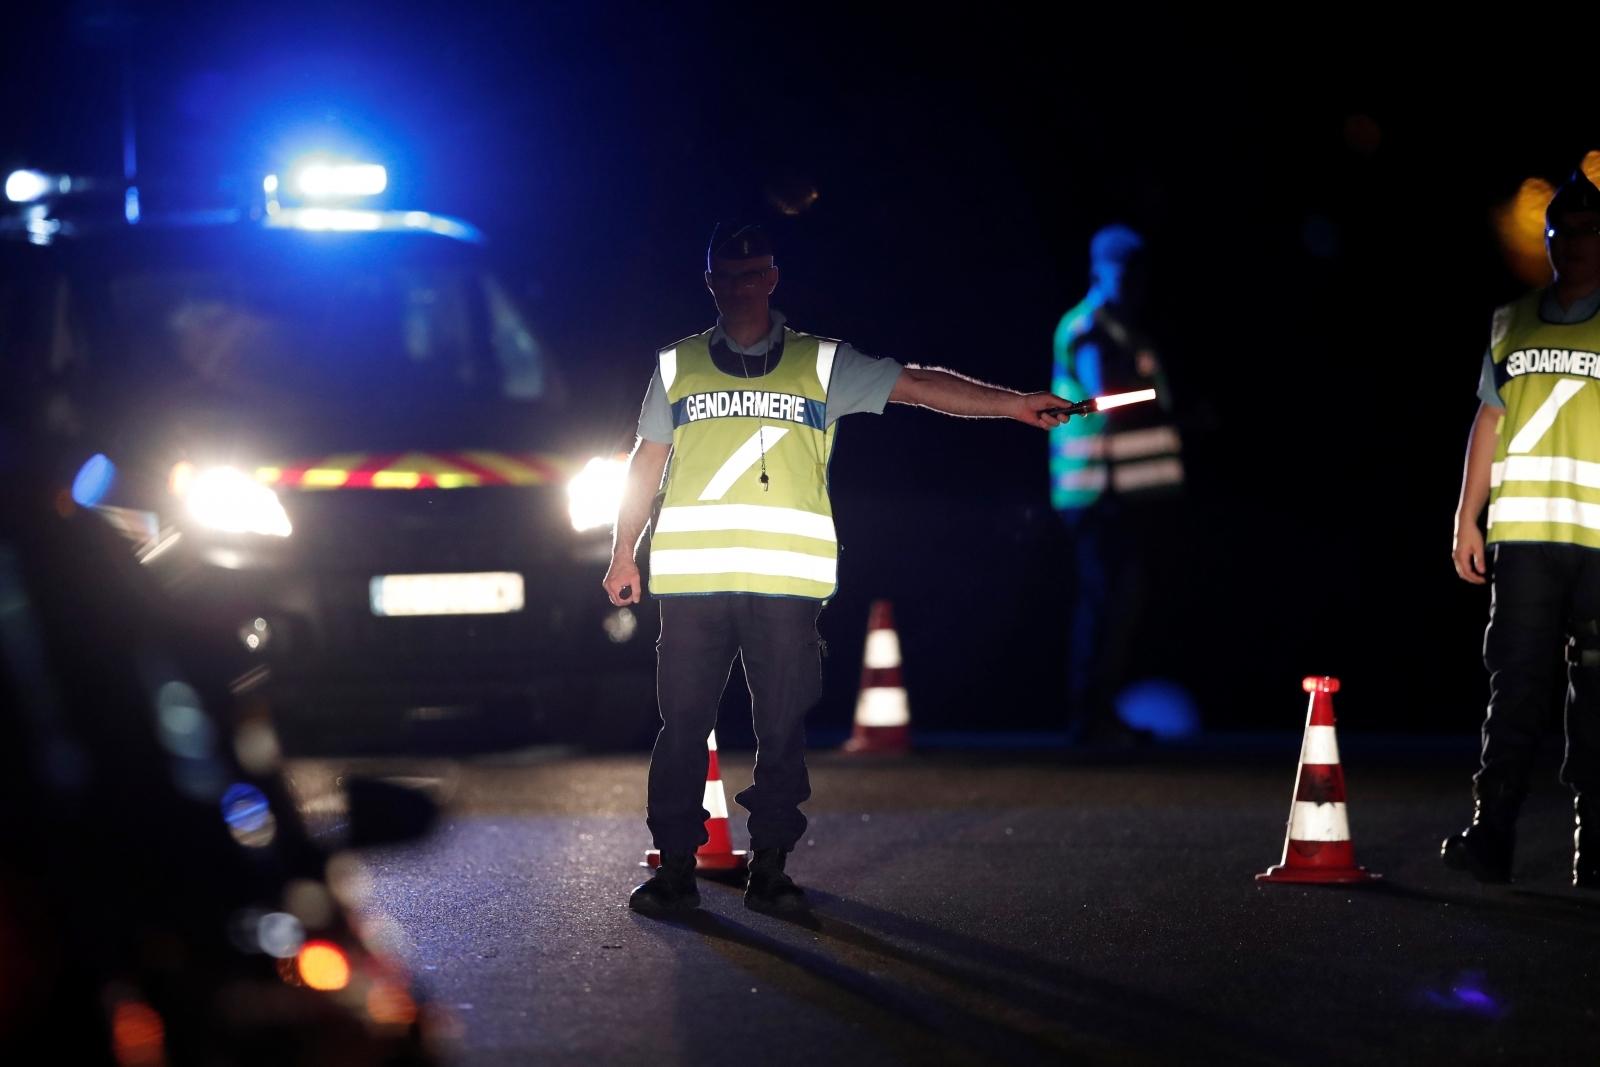 Vehicle 'deliberately' driven into pizzeria, killing 12yo girl